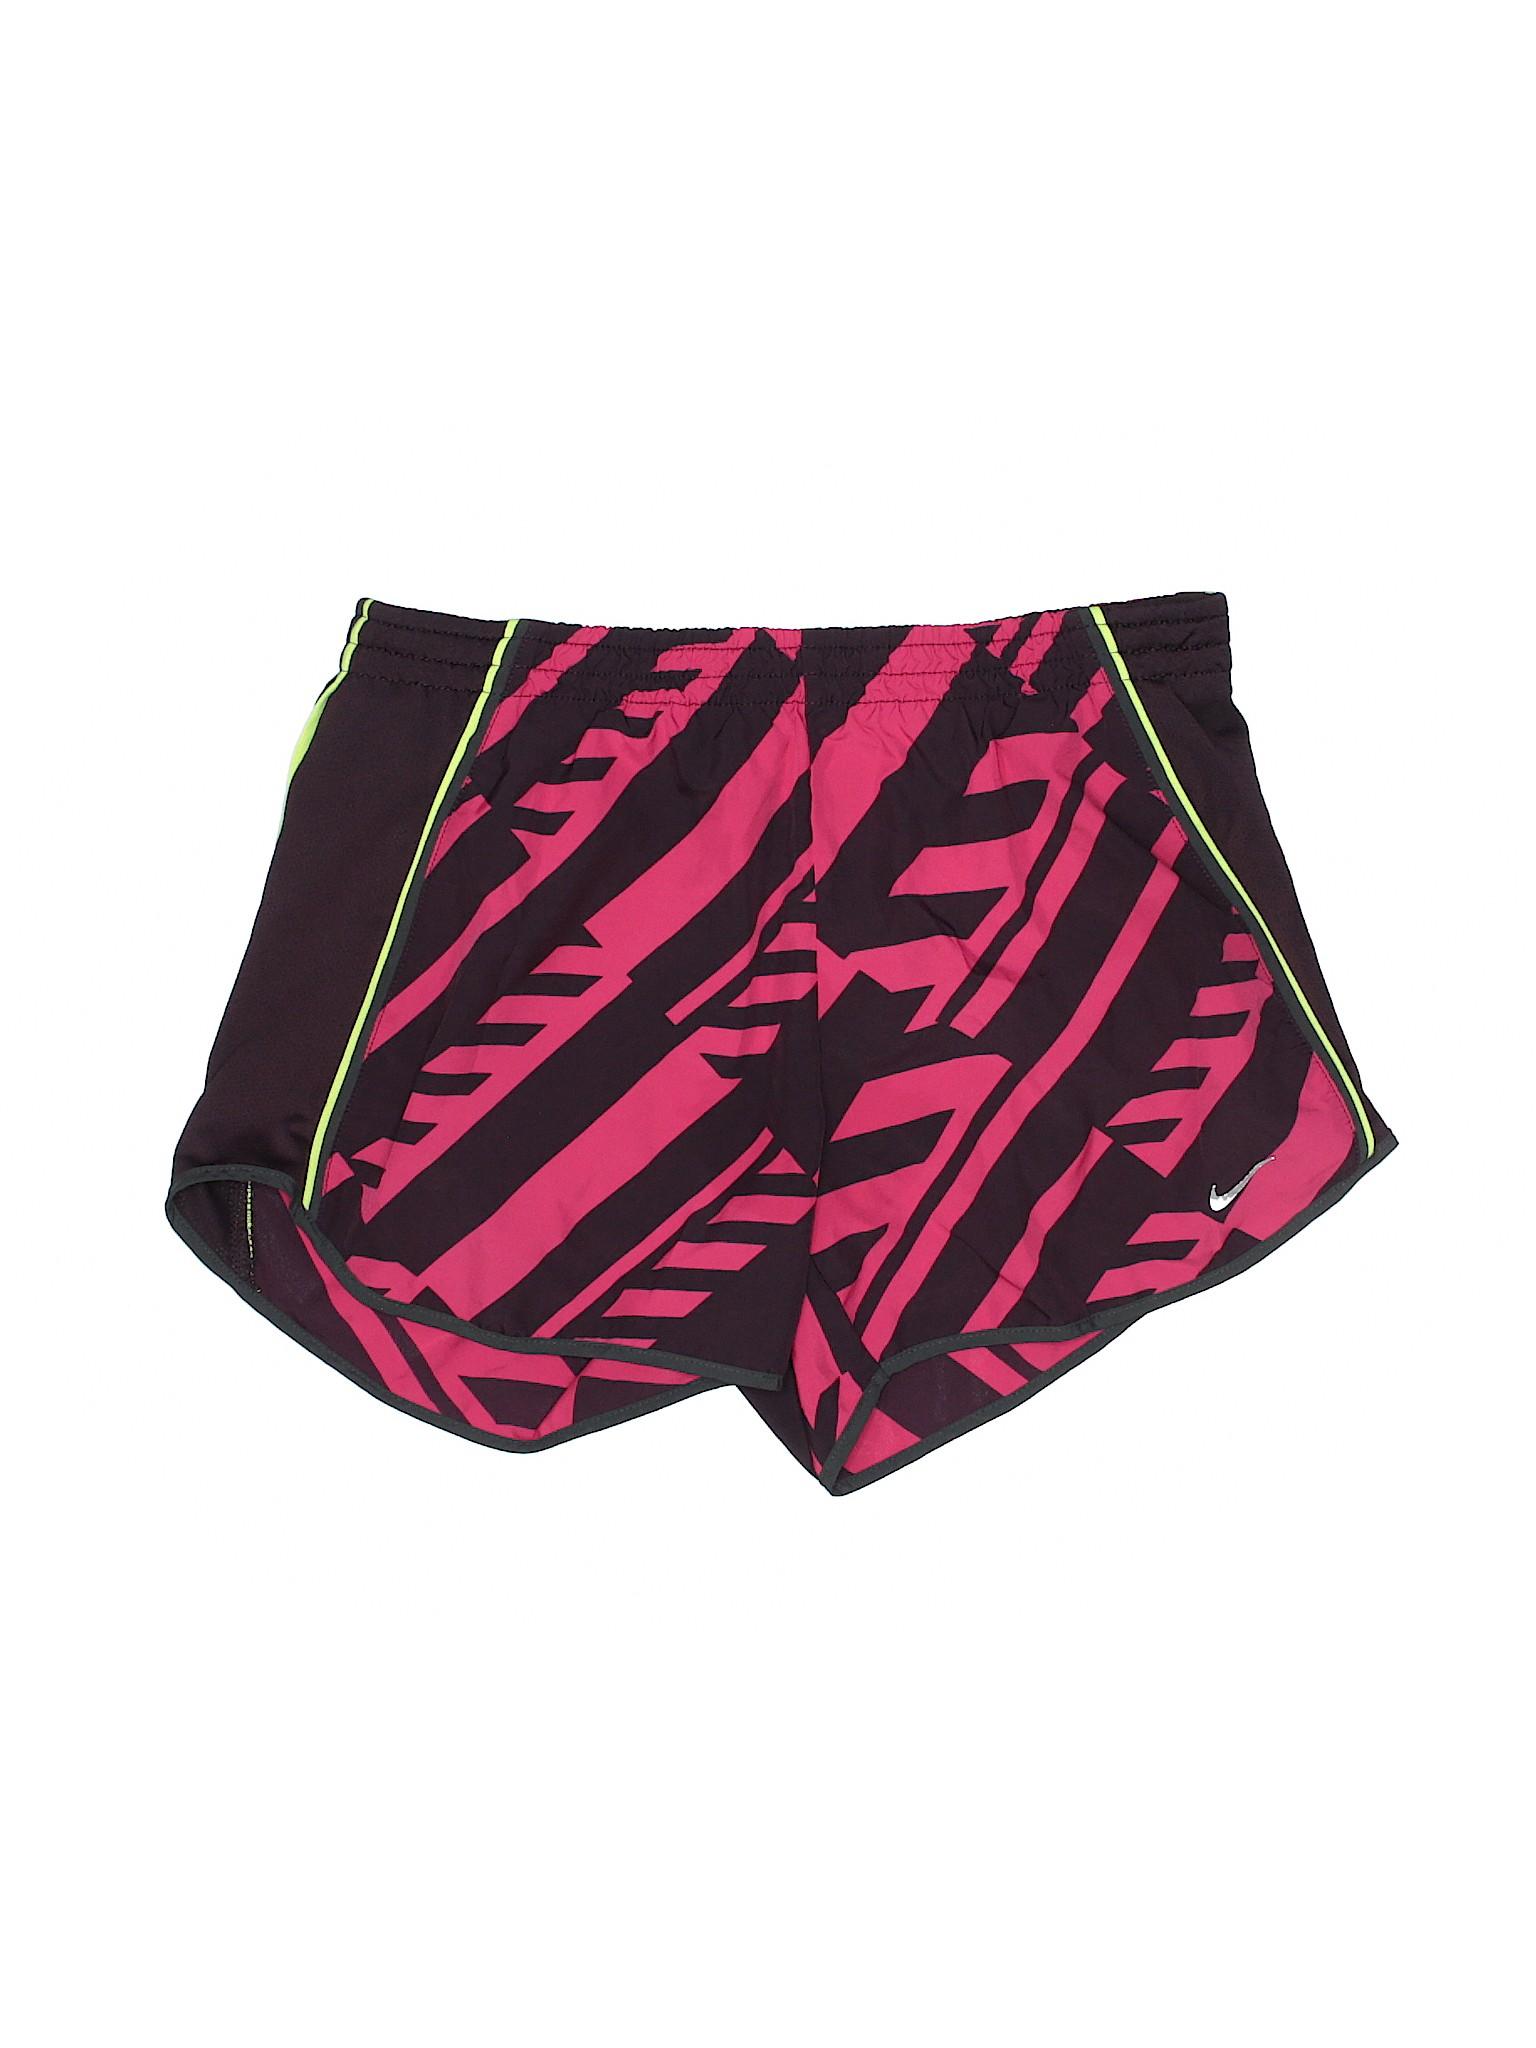 Shorts Nike Athletic Shorts Athletic Boutique Boutique Nike ErE5qTw